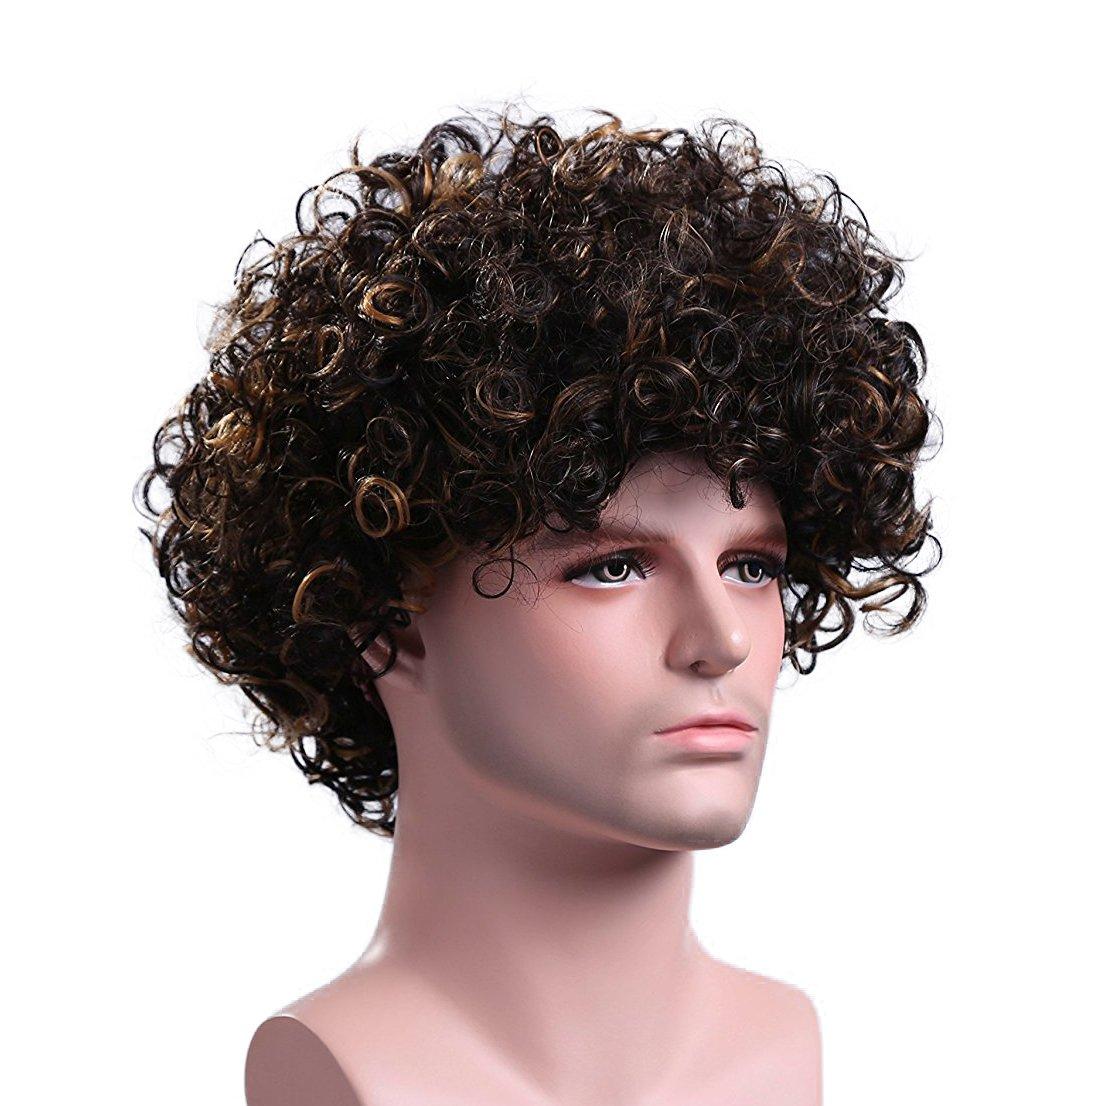 Details about Men Short Brown Blonde Curly